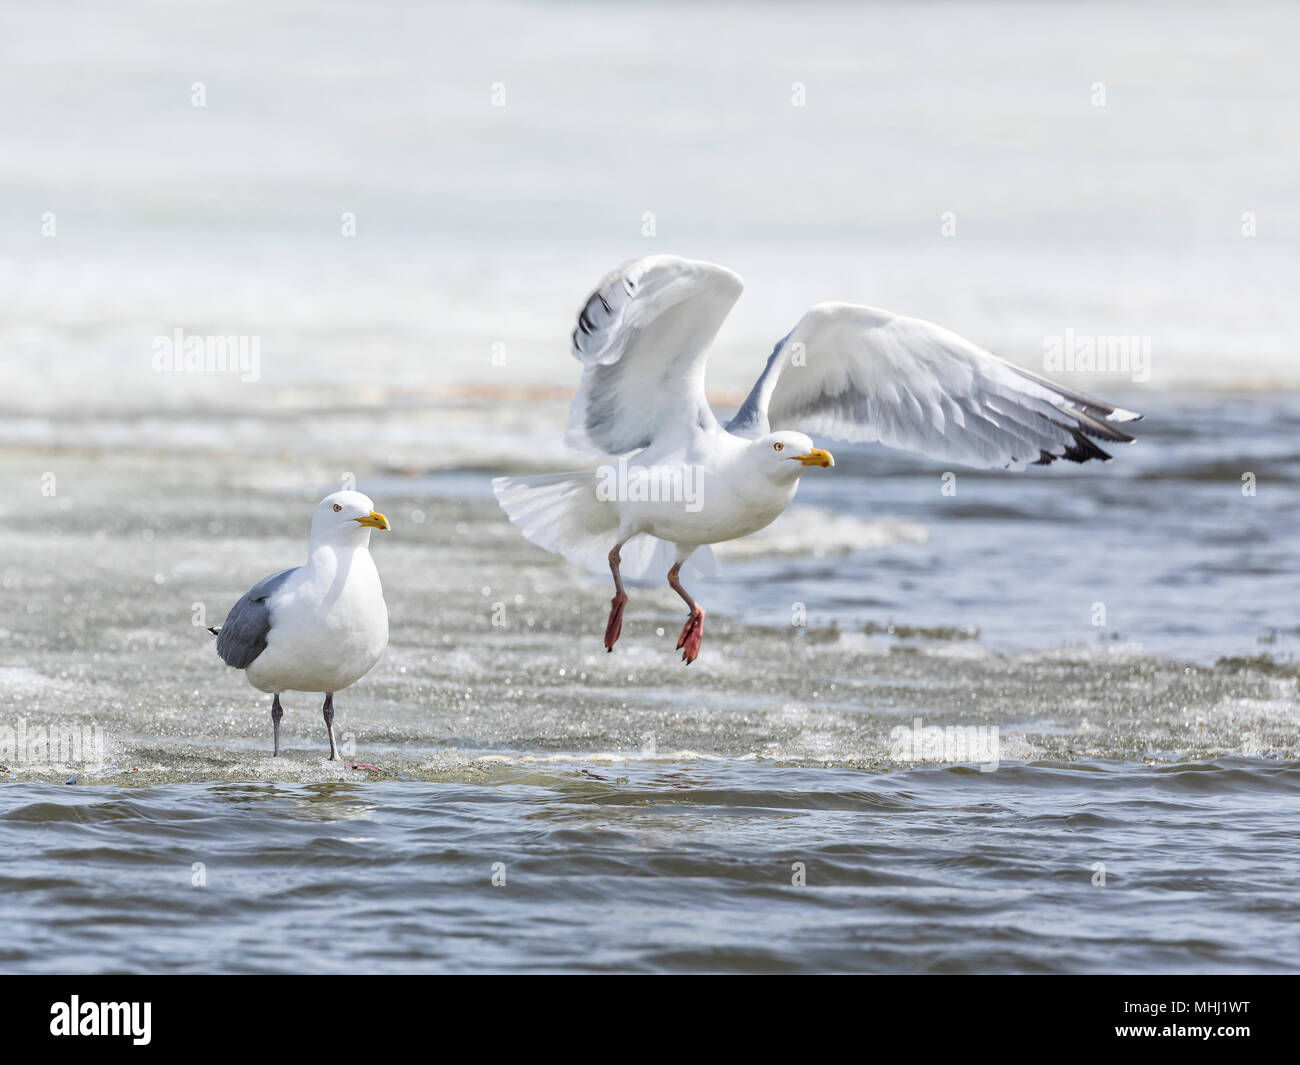 Common Gulls (Larus canus), or Mew Gulls, taking flight, Fortwhyte, Manitoba, Canada. - Stock Image